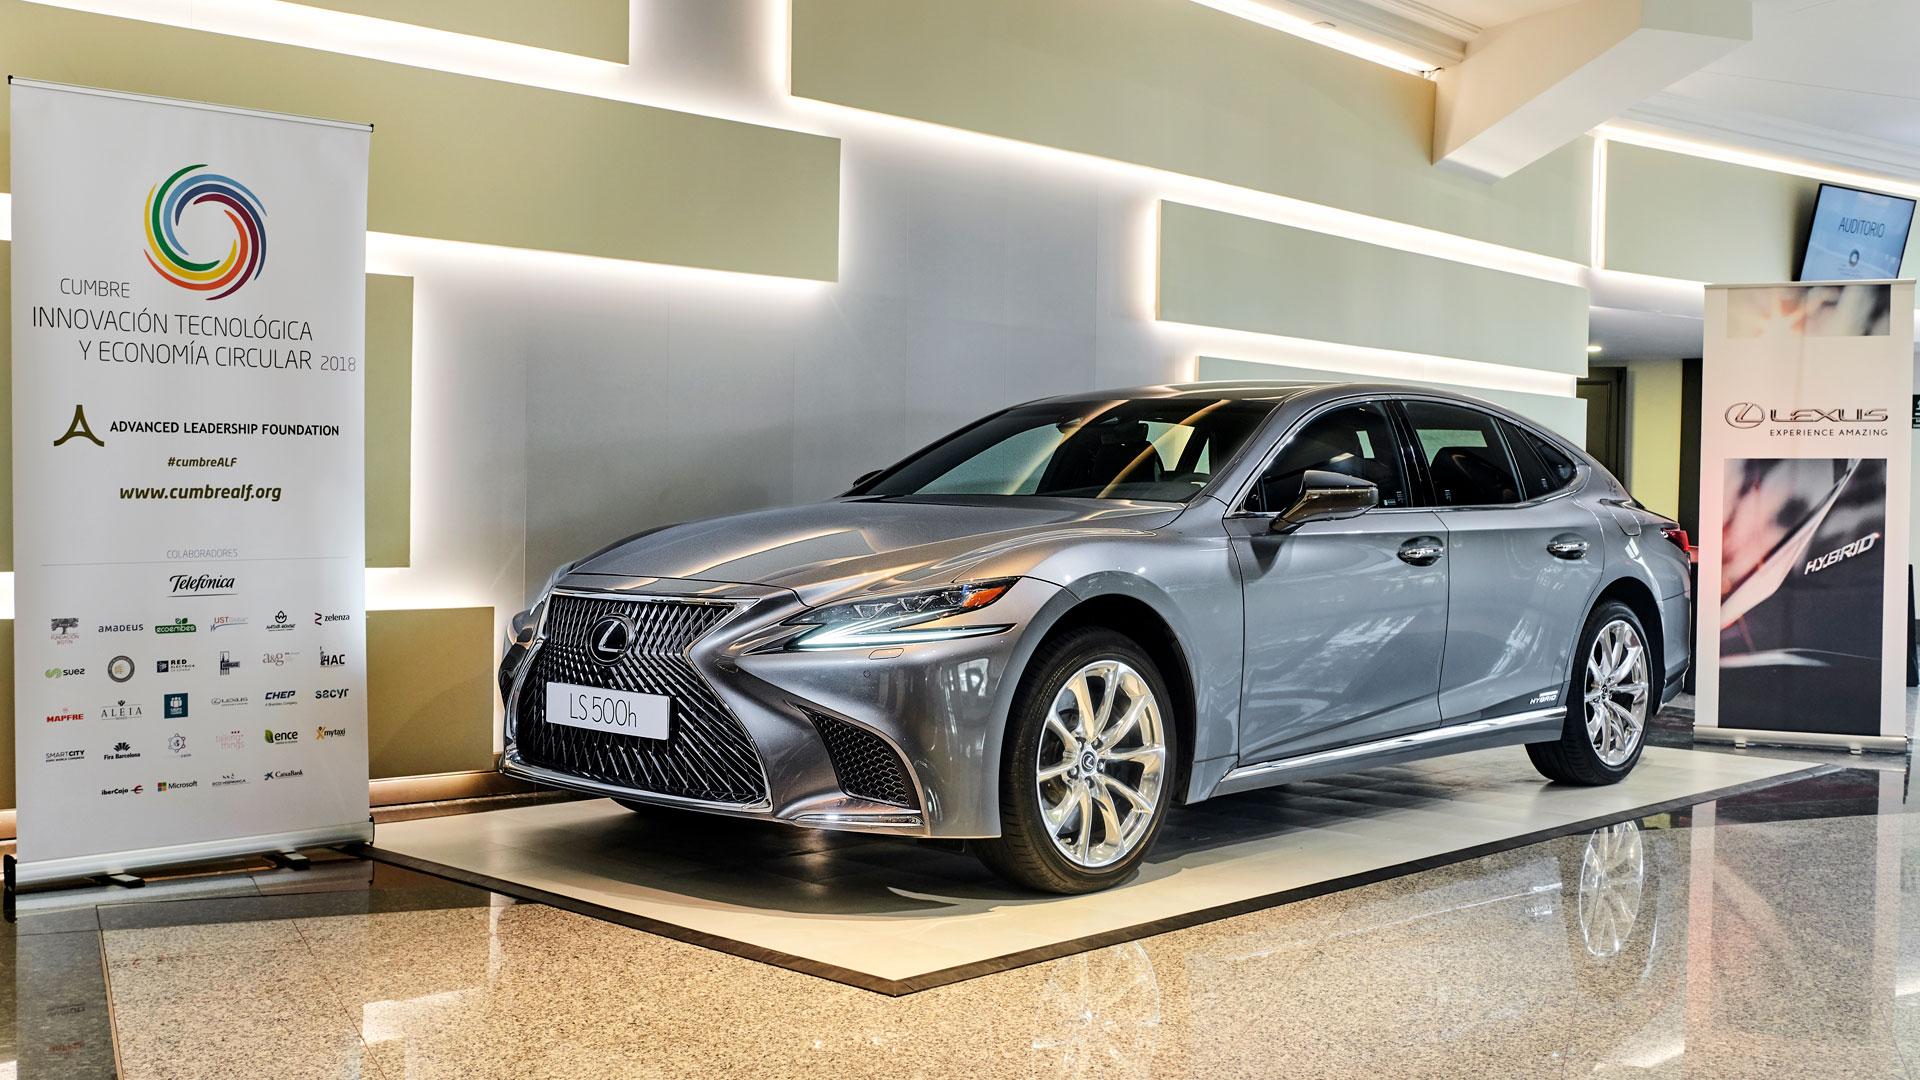 Lexus es la marca de coches oficial de la Cumbre Circular